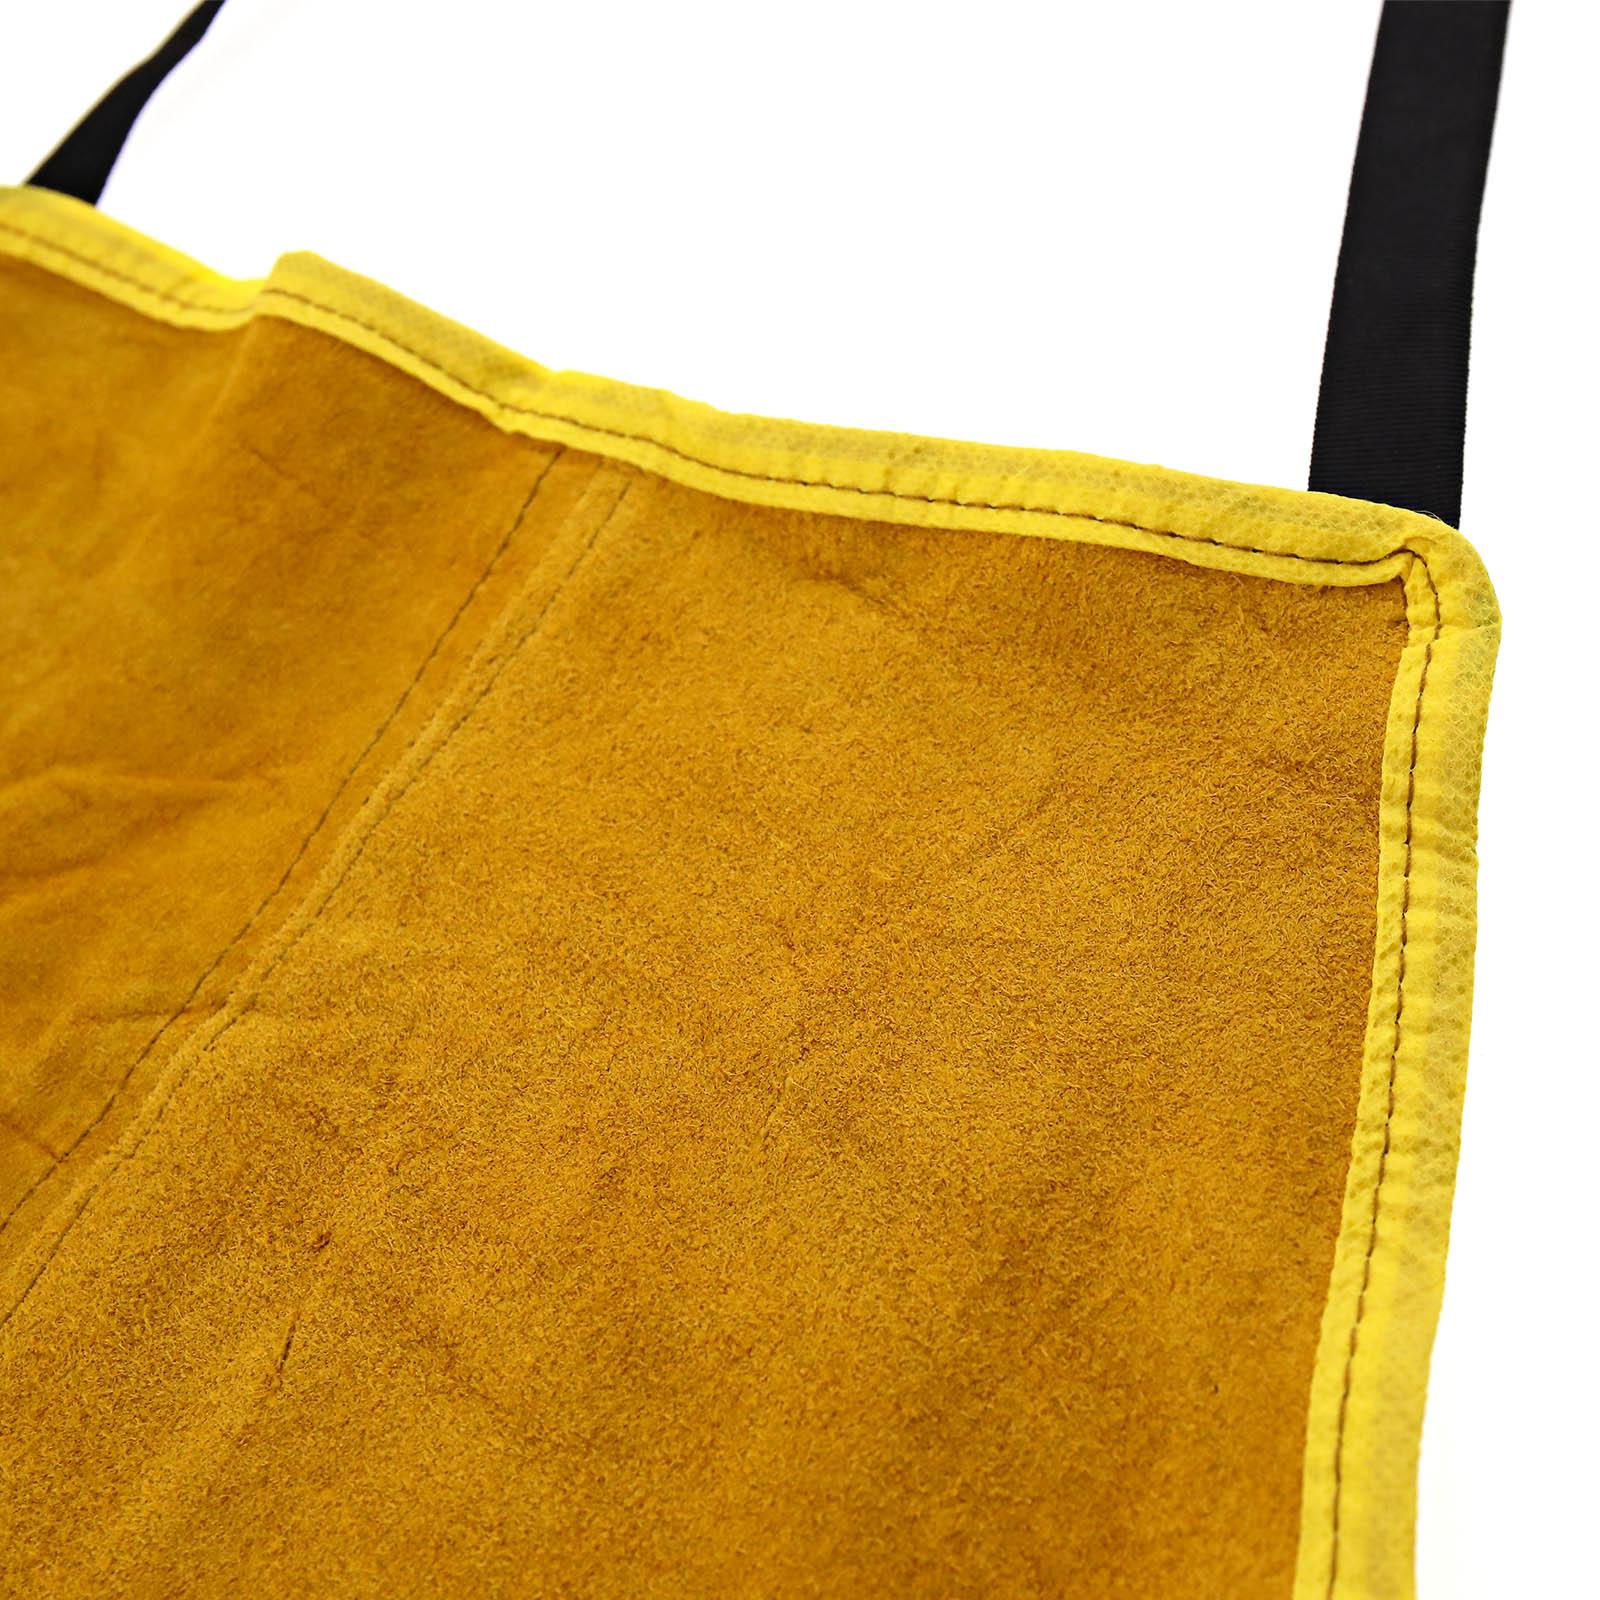 Premium Gold Leather Welders Carpenters Welding Gardeners Safety Apron